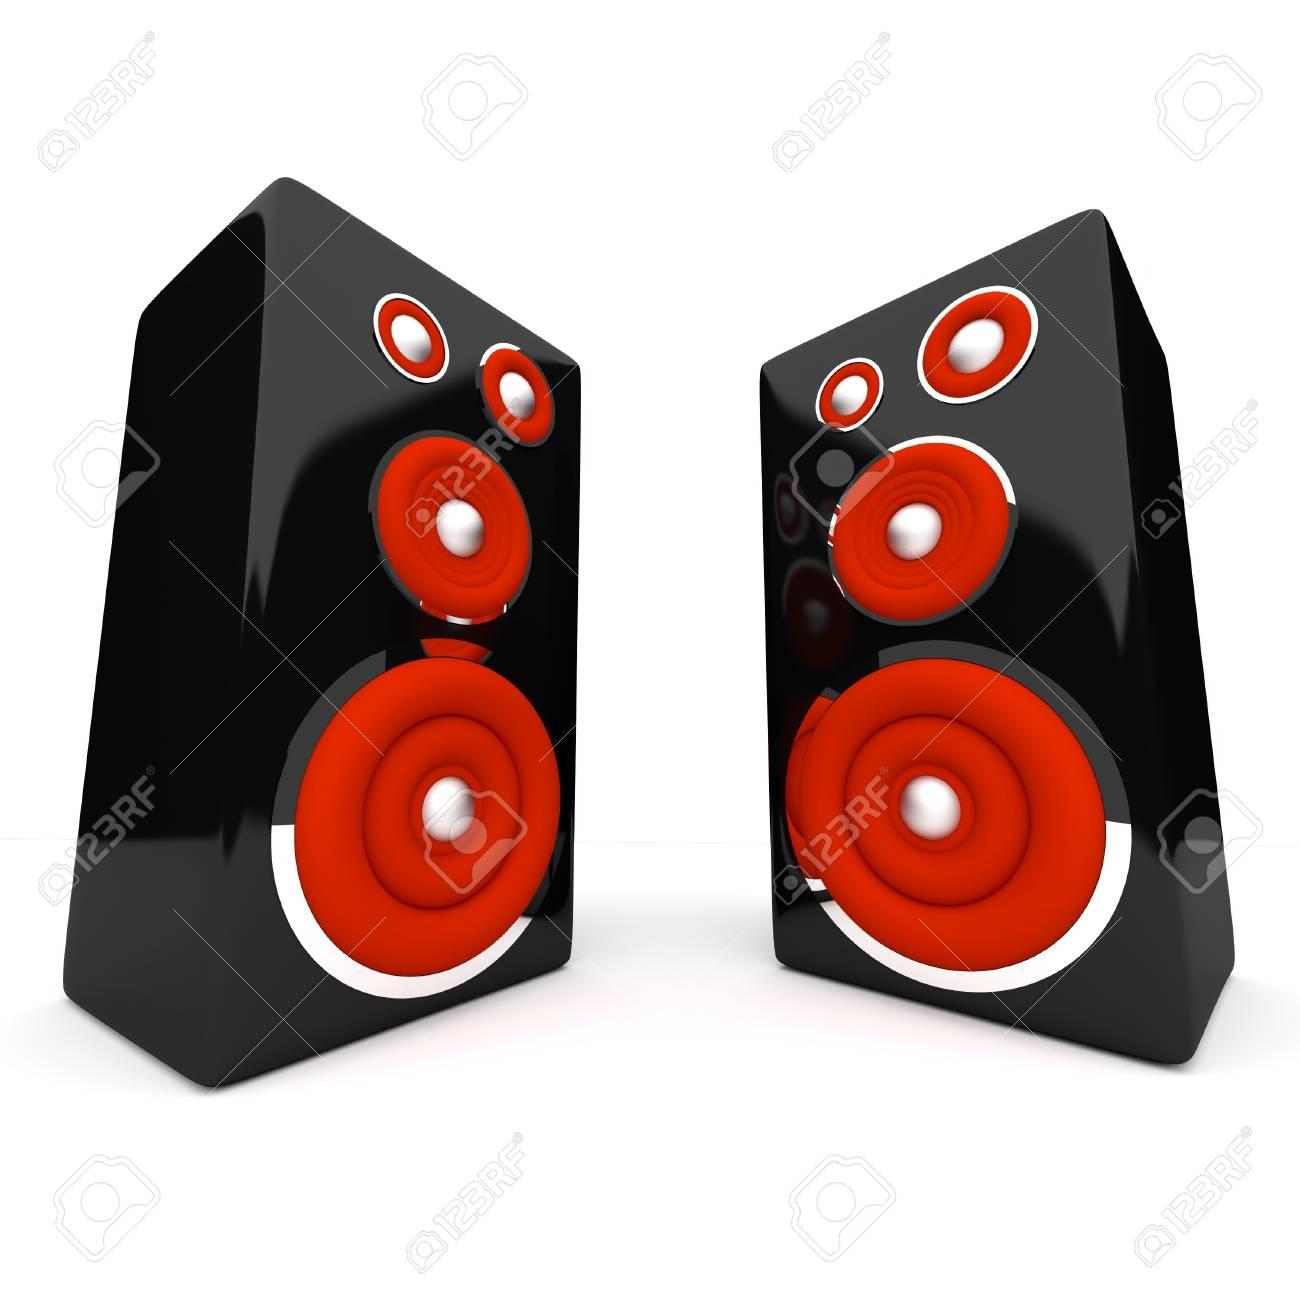 Speakers on white background Stock Photo - 17530618